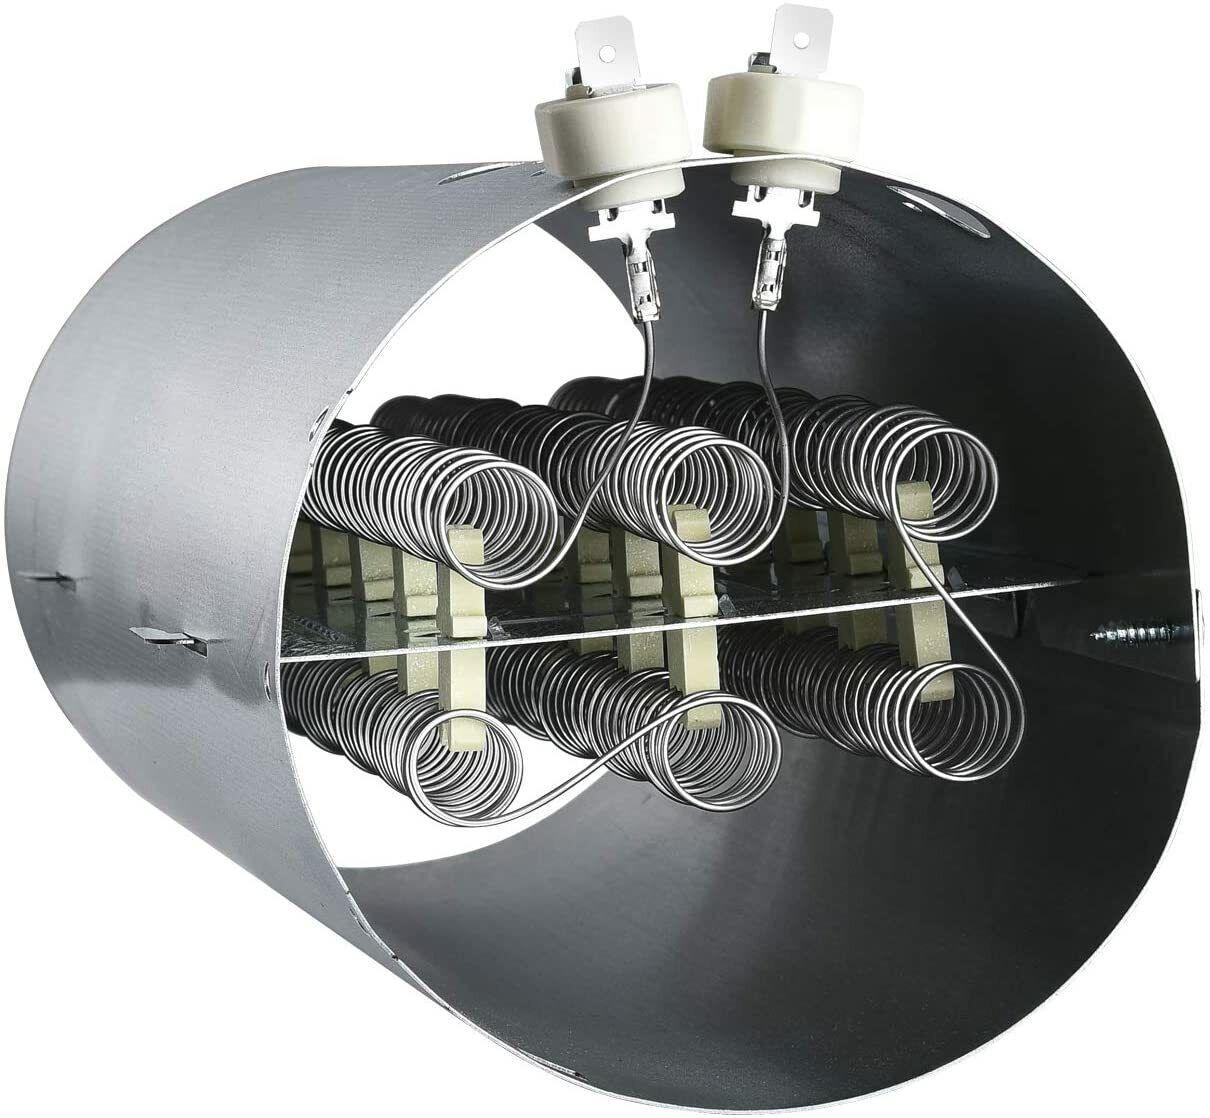 1-PK Replacement Heating Element Frigidaire FARE4044MW1 FFQE5000QW0 FFQE5000QW1 - $44.35